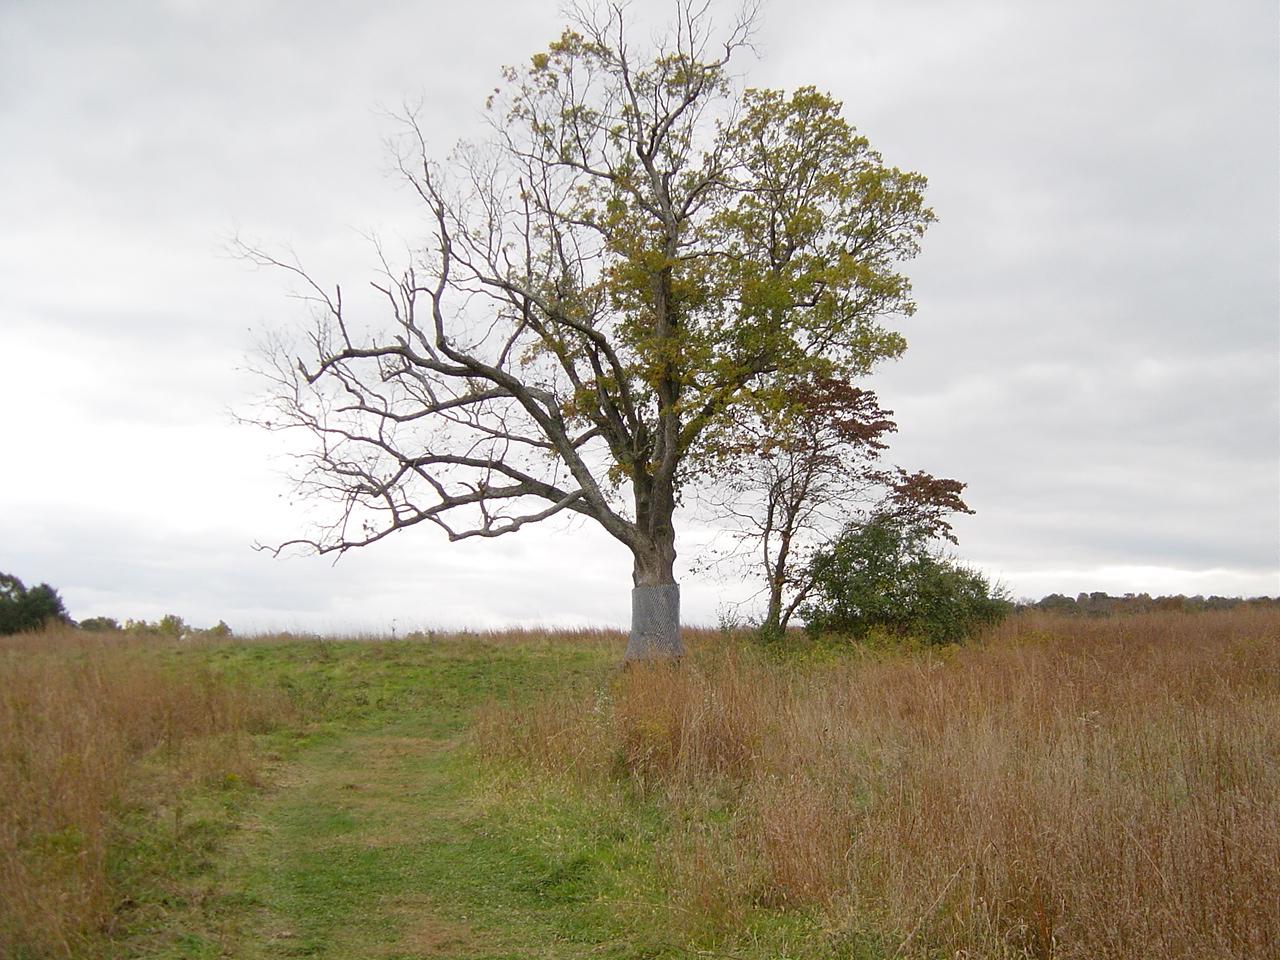 New Jersey's Devil Tree